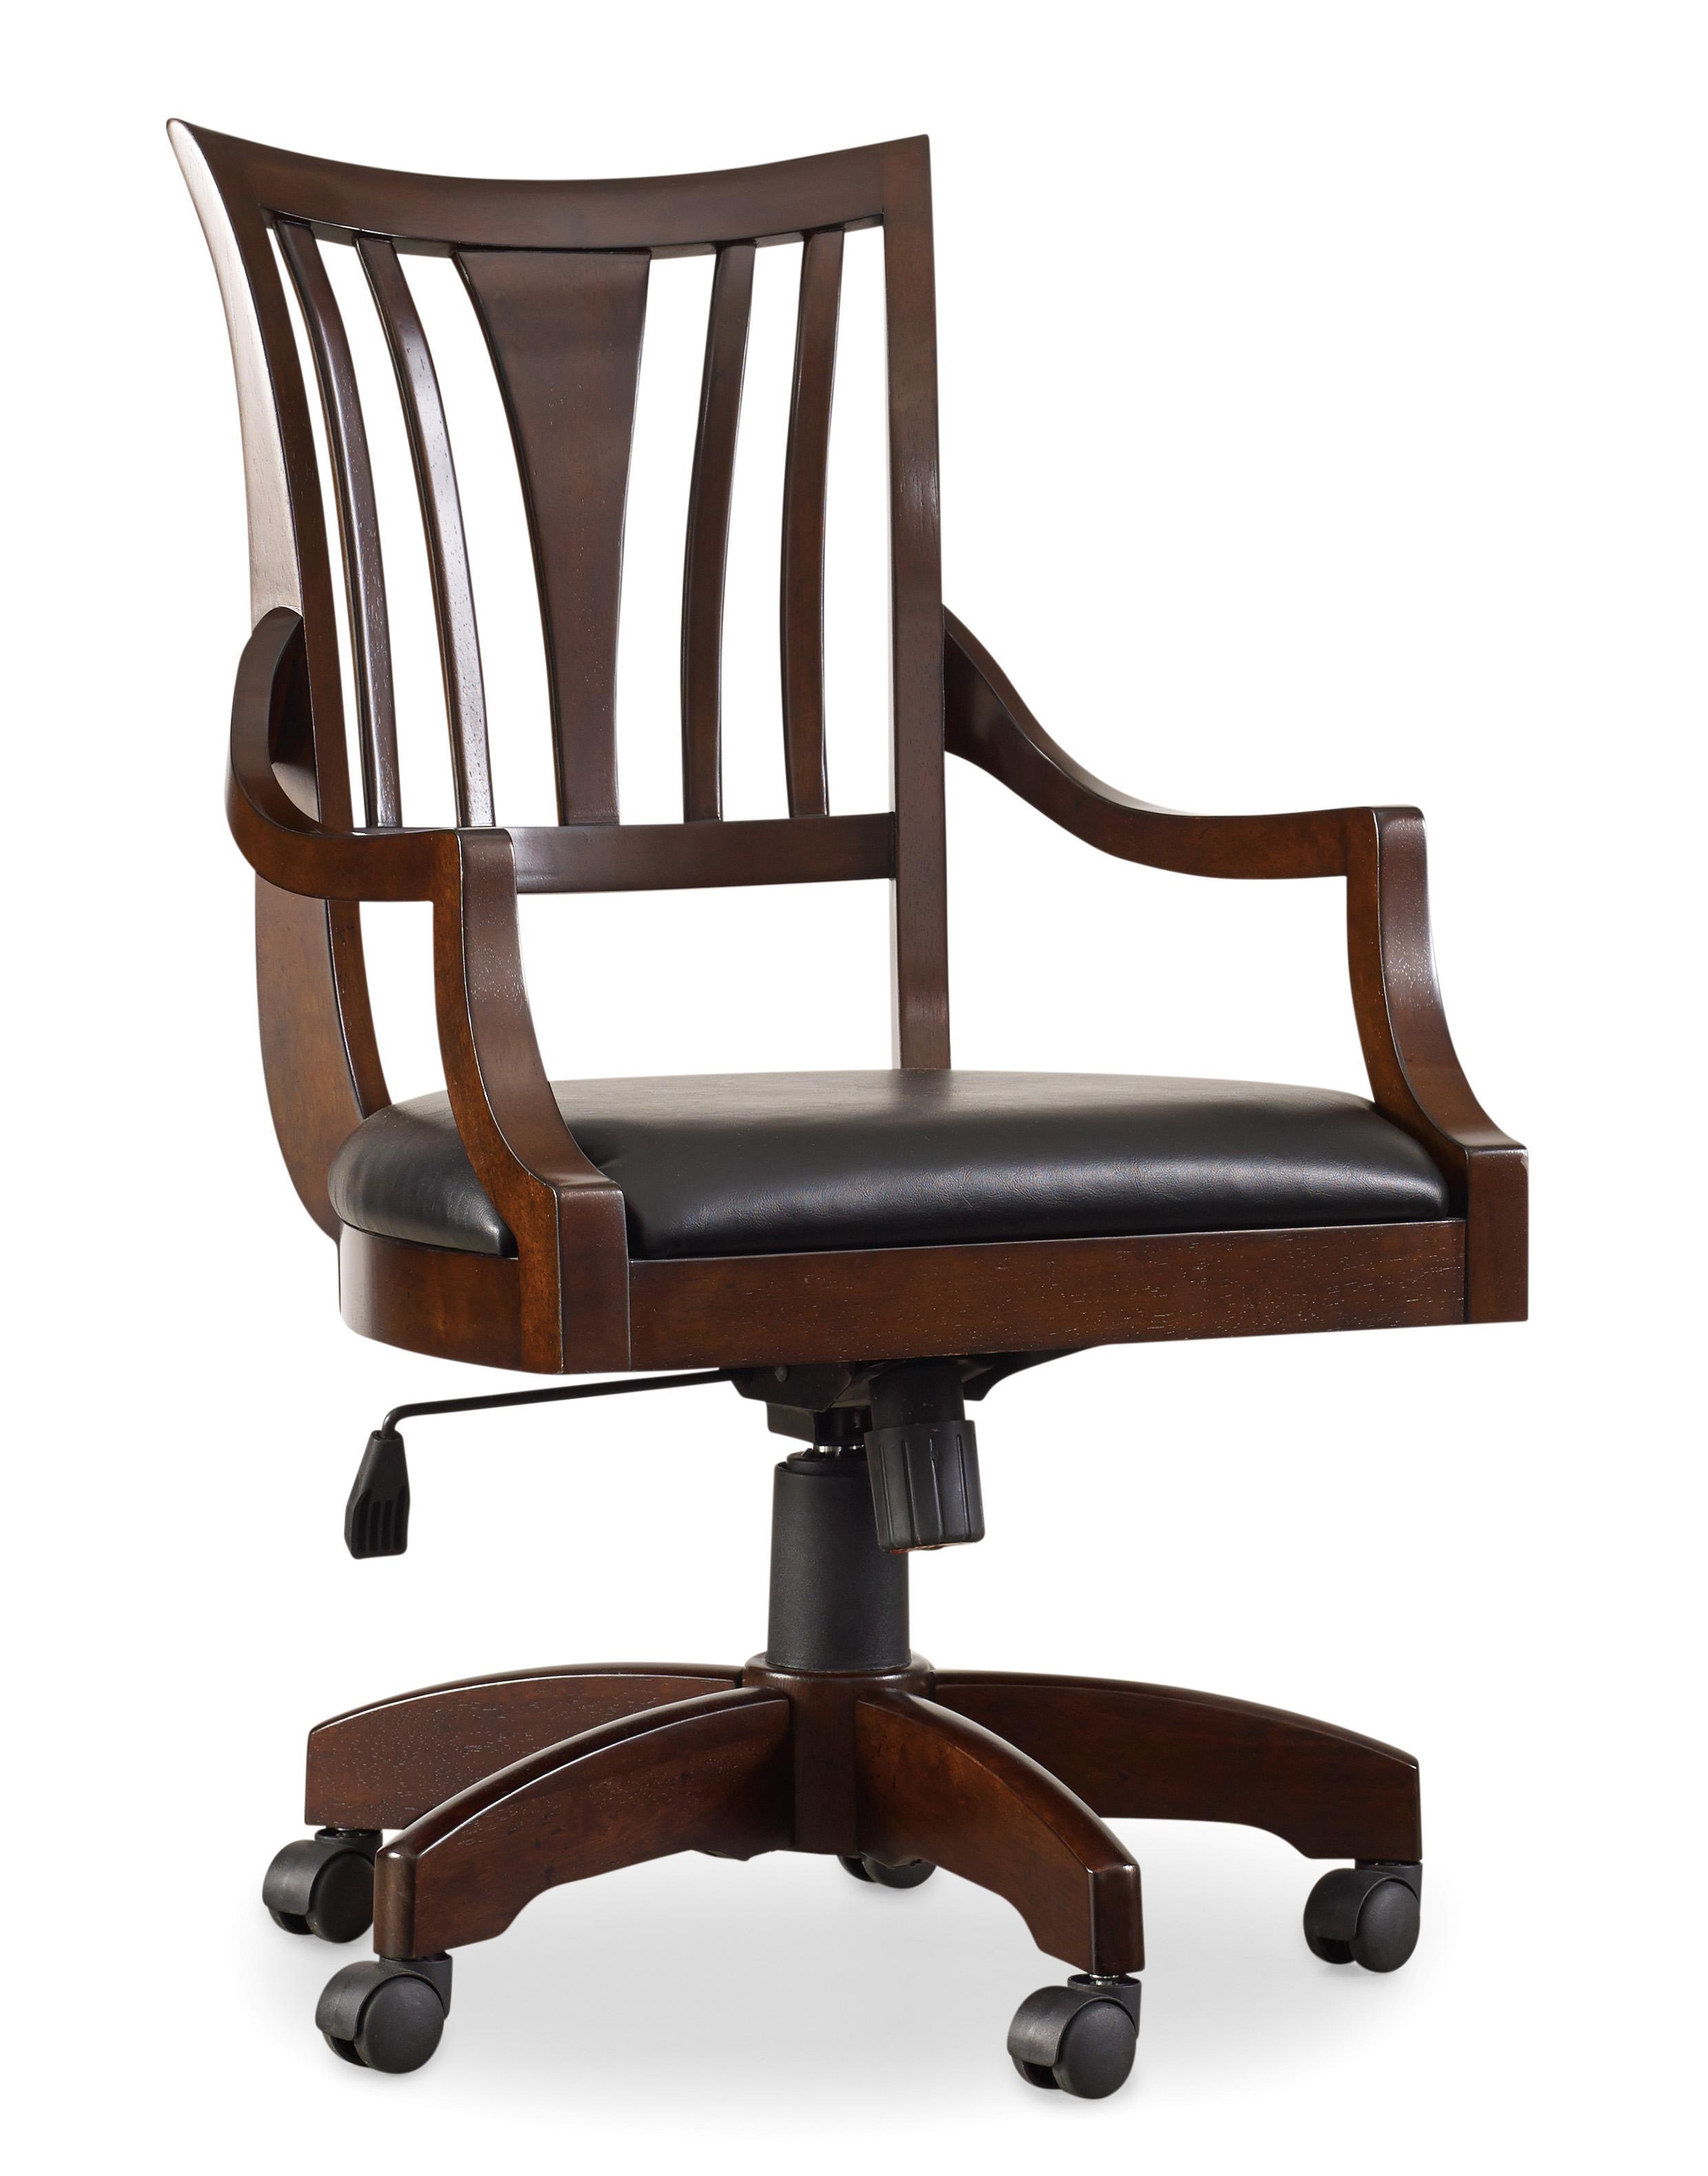 Hooker Furniture Latitude Tilt Swivel Desk Chair - Item Number: 30220